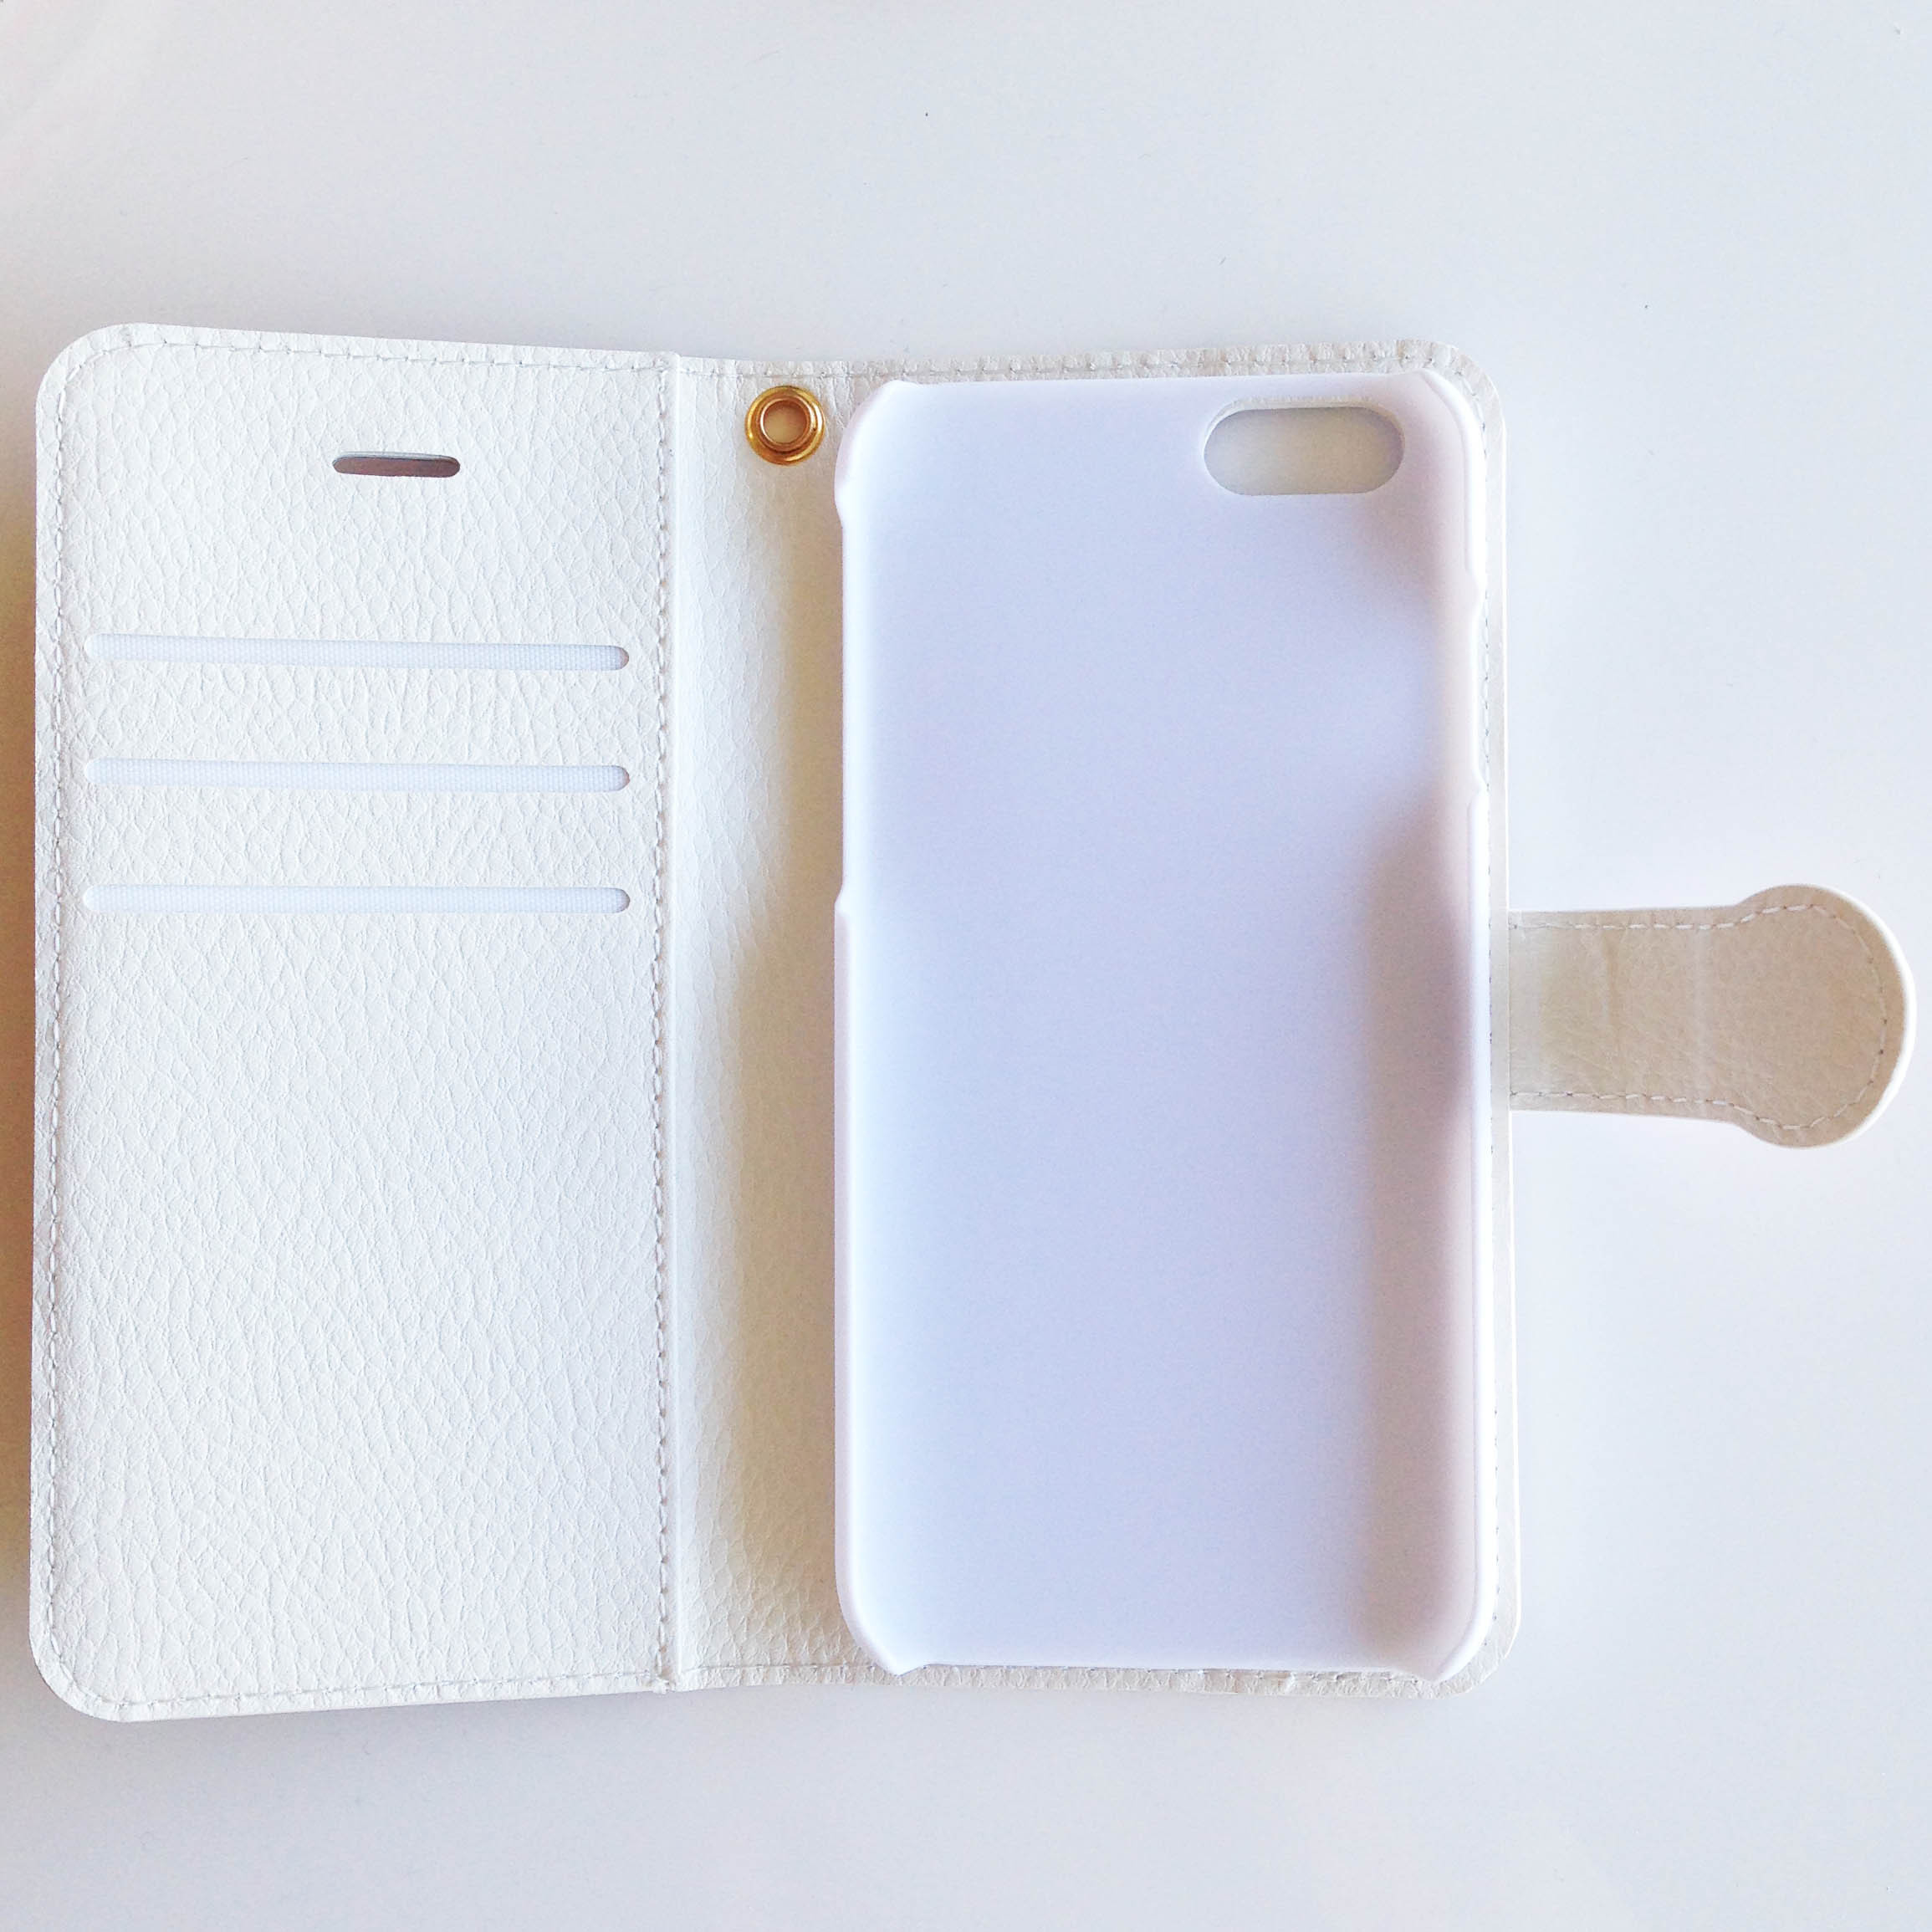 (iPhone)クララ 手帳型スマホケース - 画像2